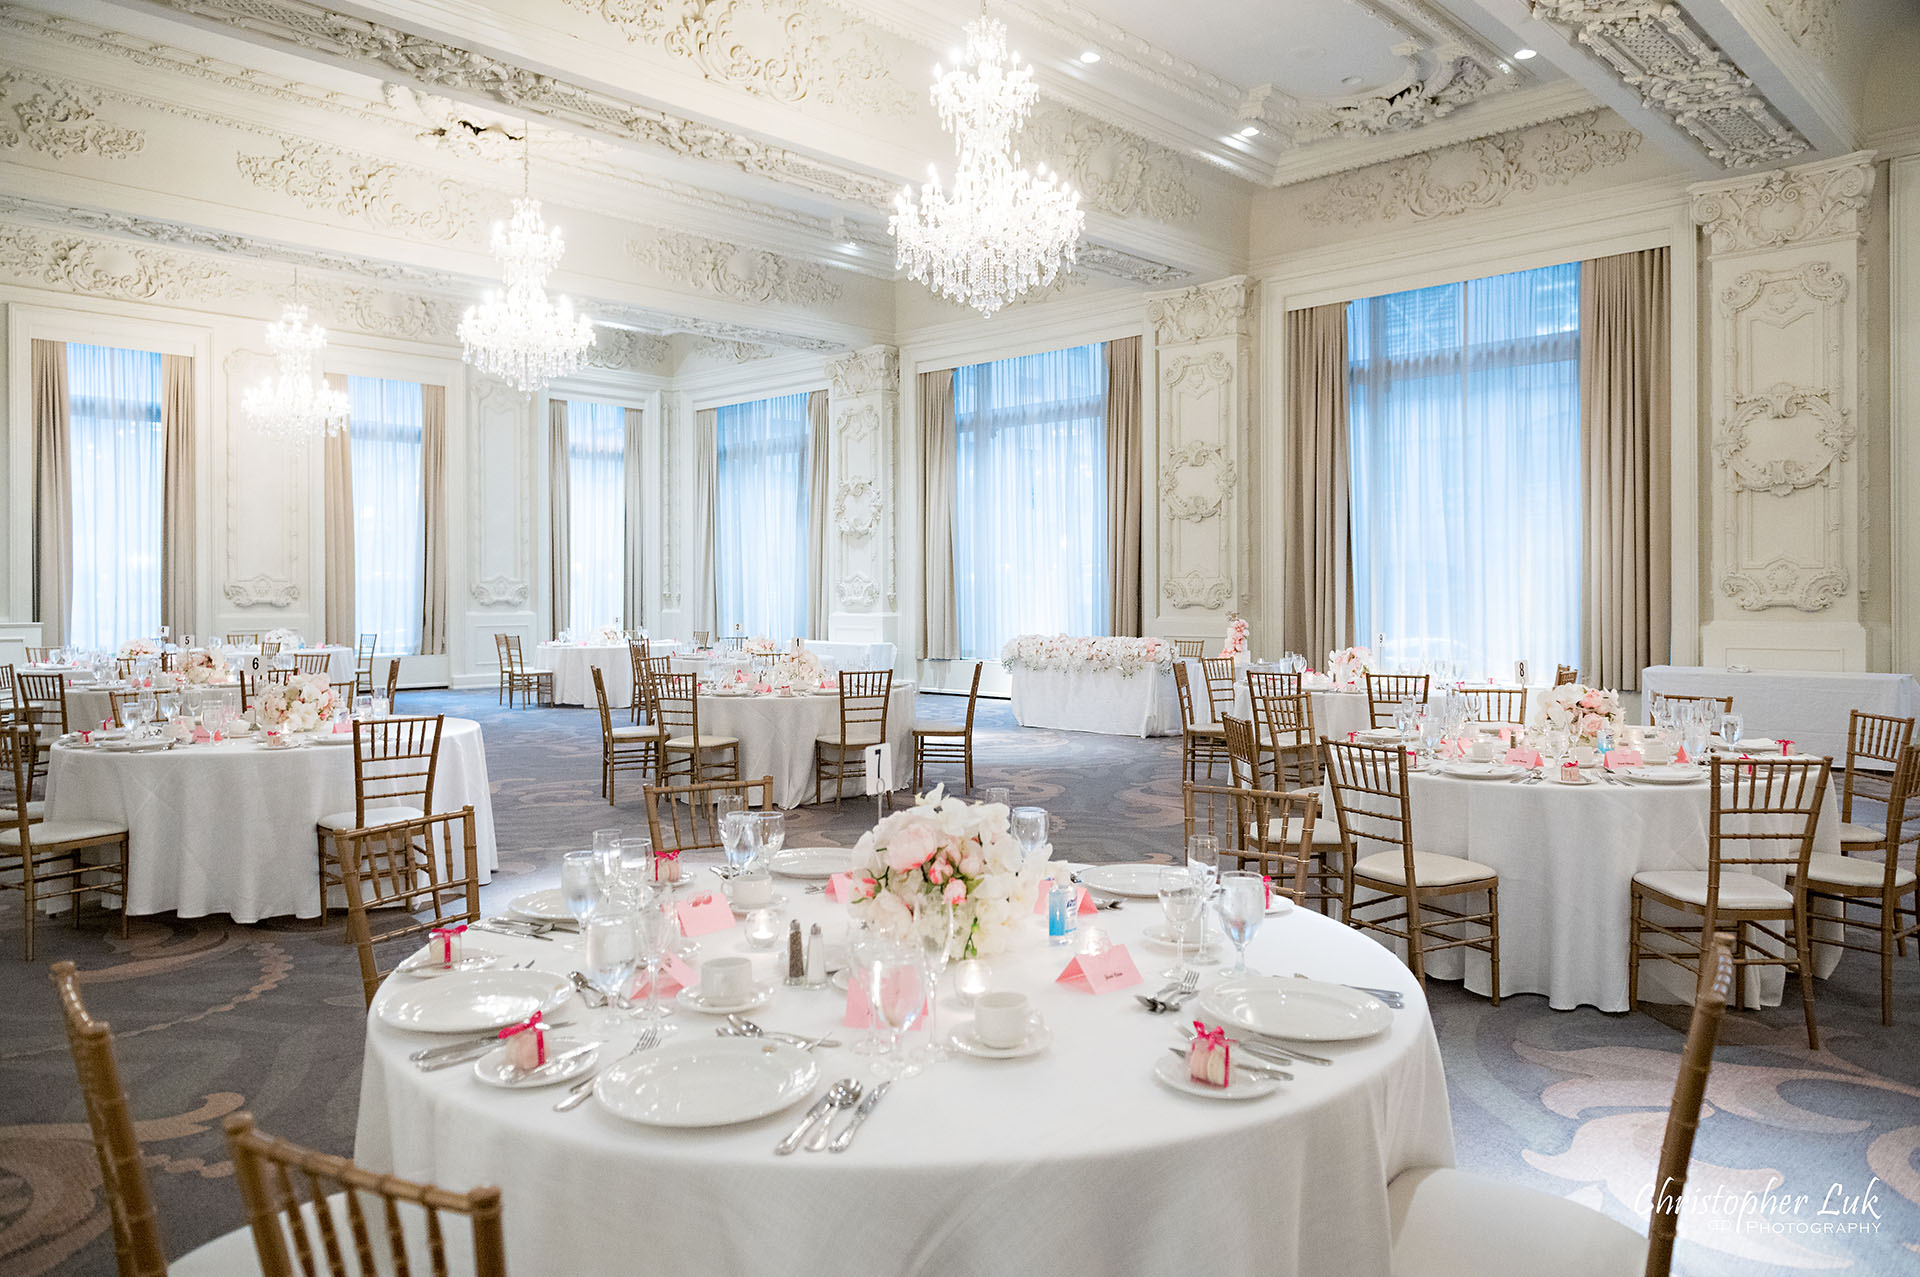 King Edward Hotel Crystal Ballroom Toronto Wedding Photographer MicroWedding Sovereign Ballroom Chandeliers Wide Angle